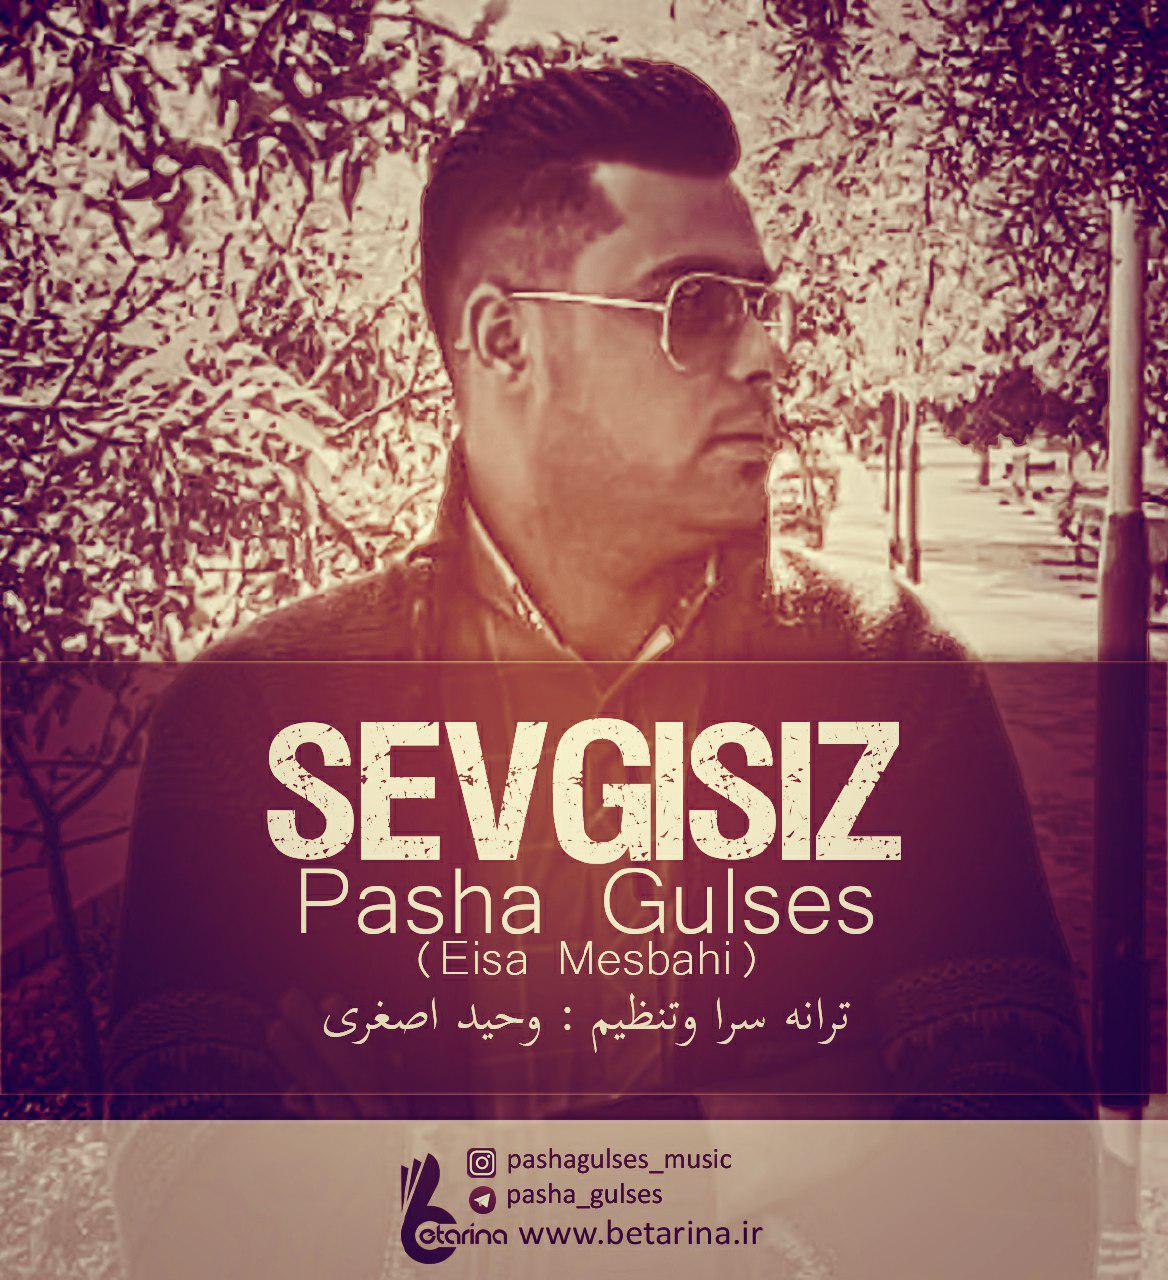 http://s9.picofile.com/file/8332037776/29Pasha_Gulses_Eisa_Mesbahi_Sevgisiz.jpg